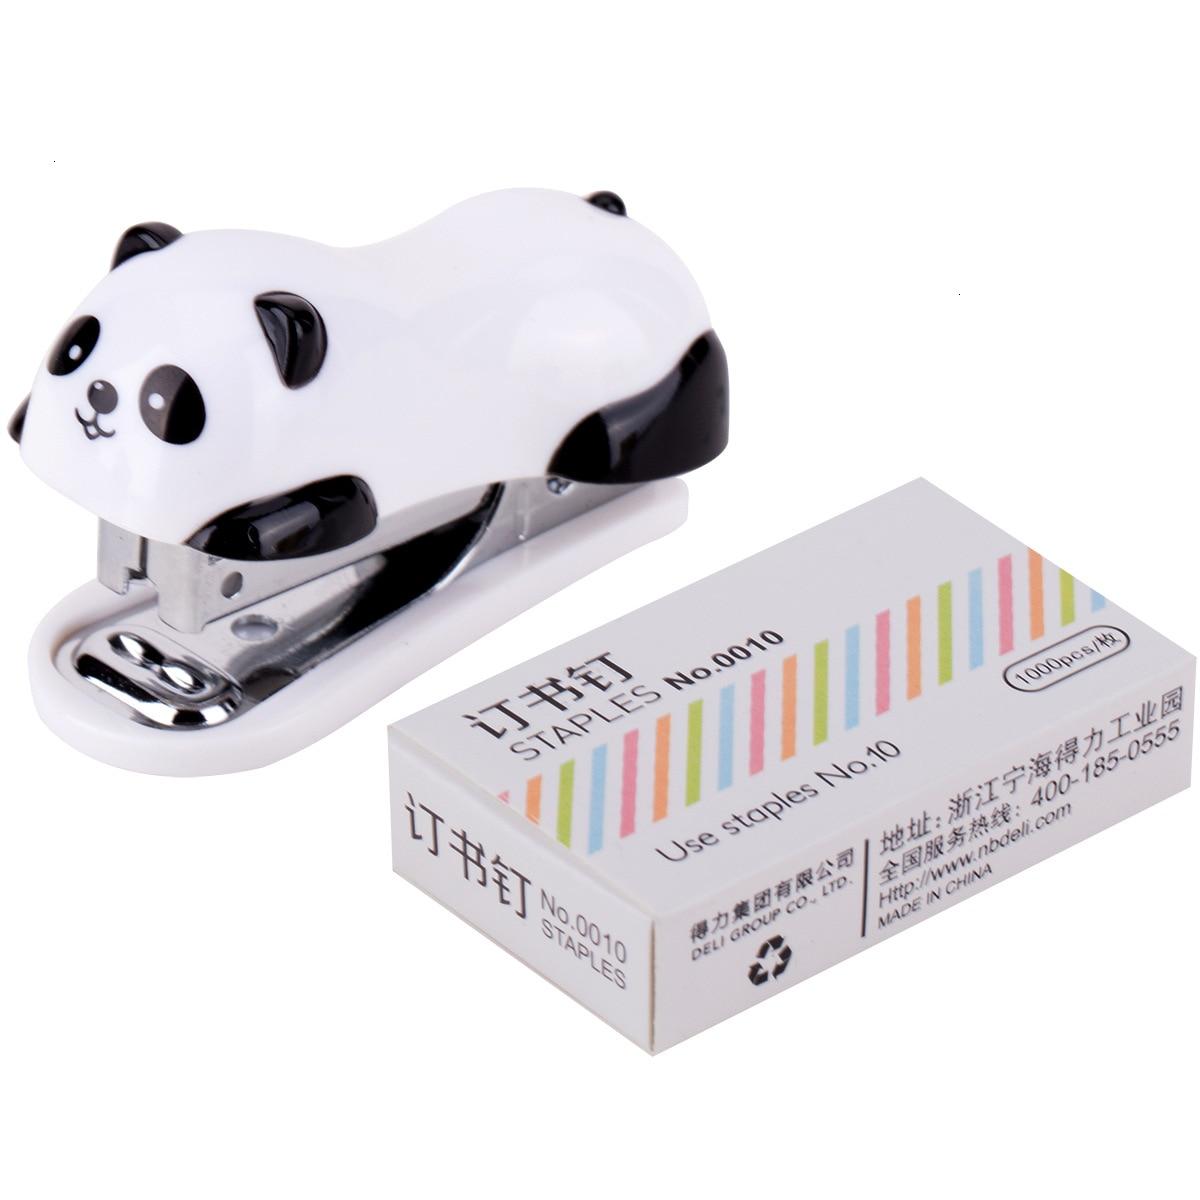 1 PCSCute New Mini Panda Stapler Set Cartoon Office School Supplies Staionery Paper Clip Binding Binder Book Sewer